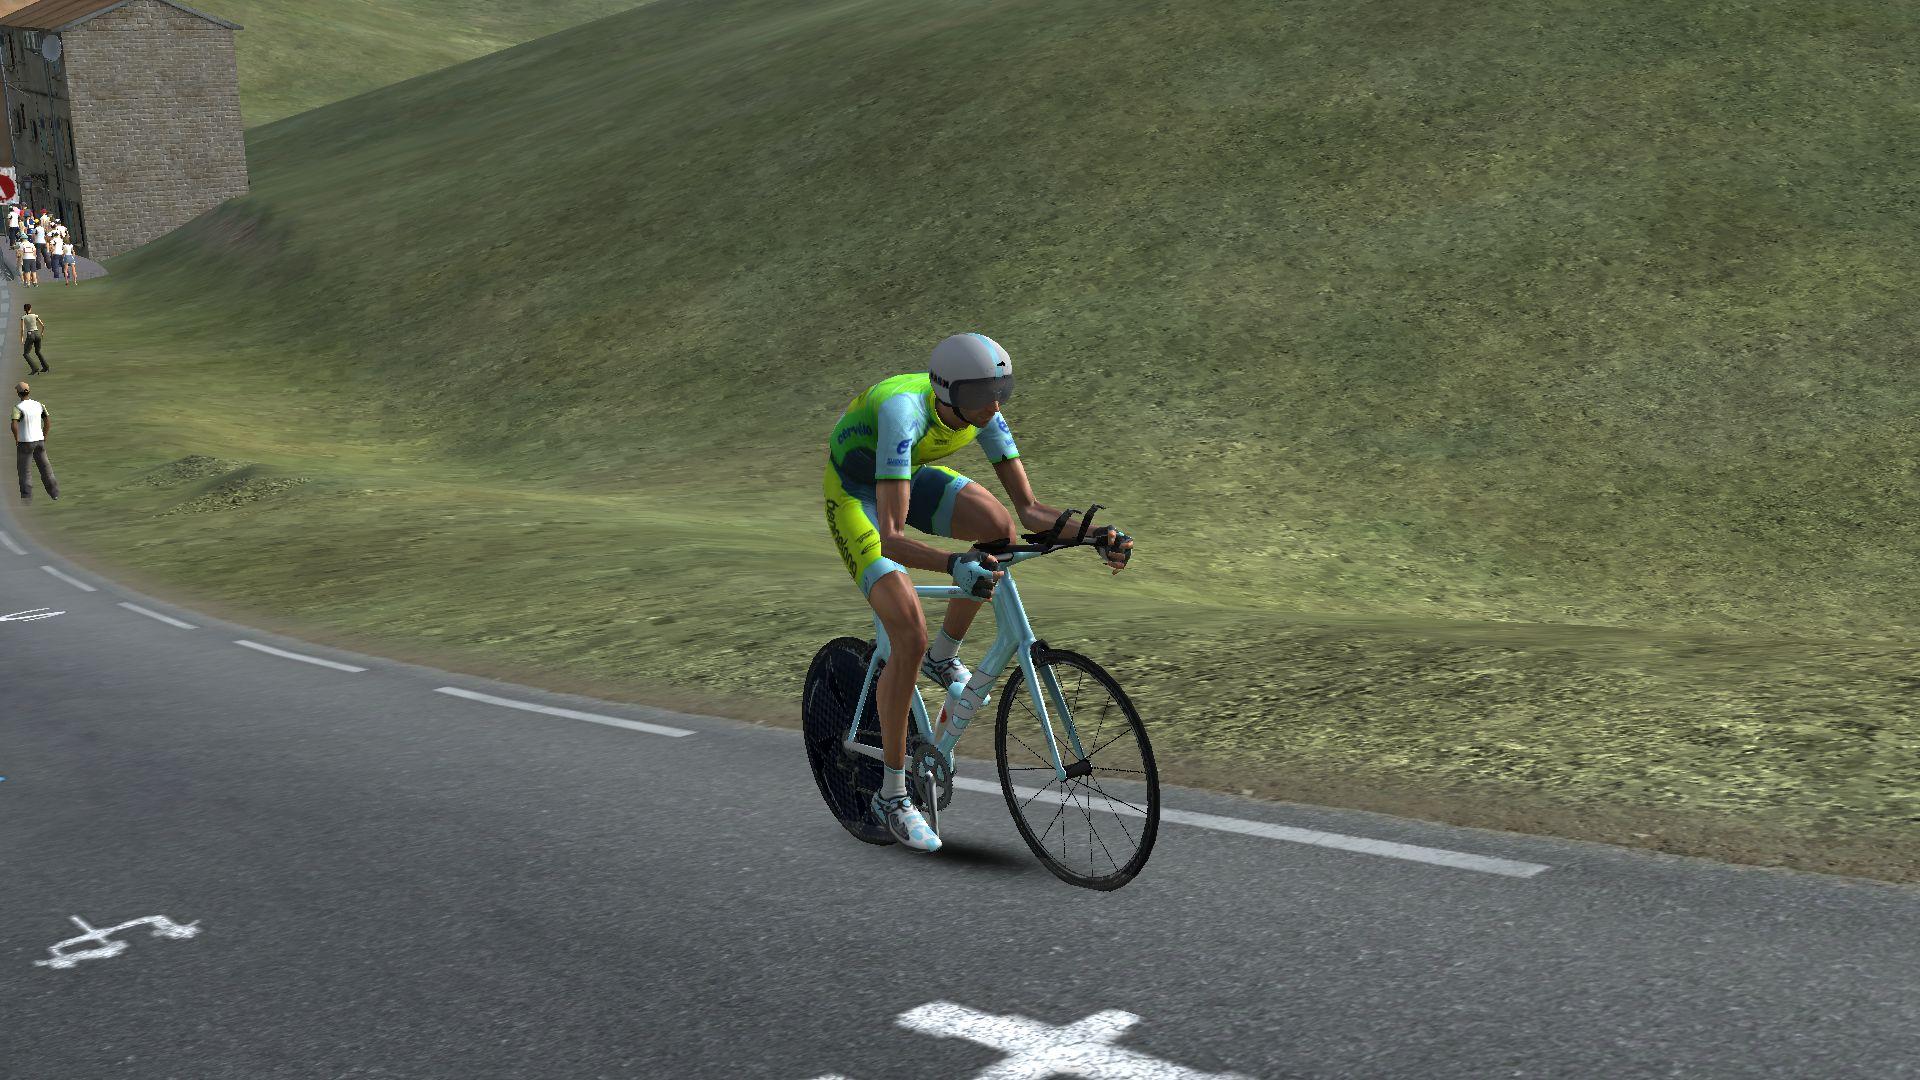 pcmdaily.com/images/mg/2019/Races/GTM/Giro/mg19_giro_09_PCM0035.jpg